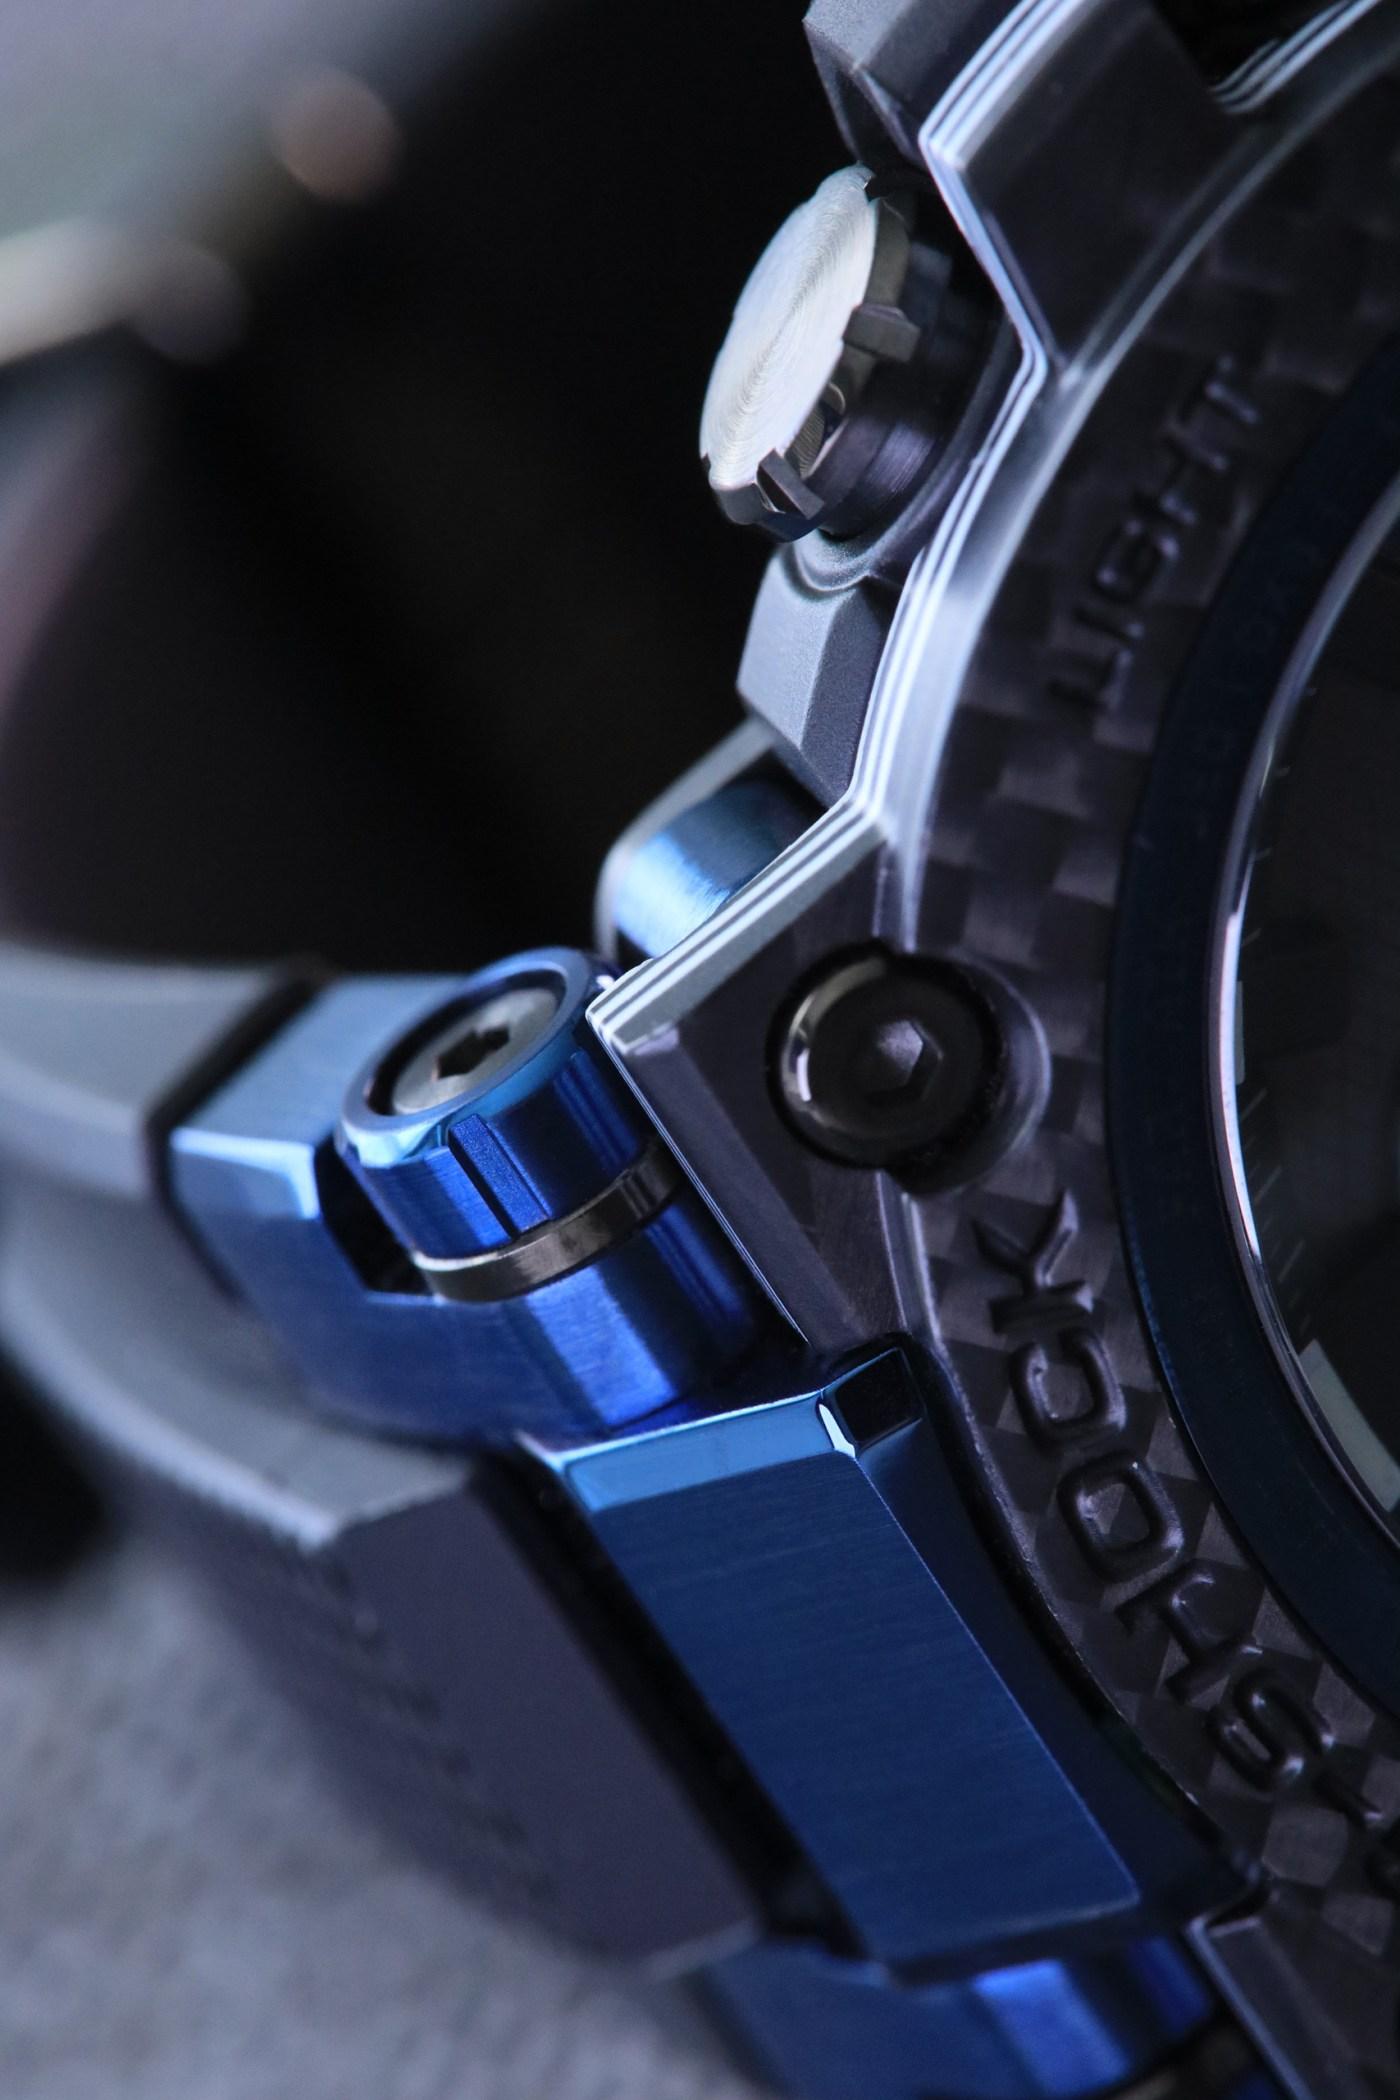 G-Shock MT-G Carbon Fiber MTGB1000XB-1A case detail